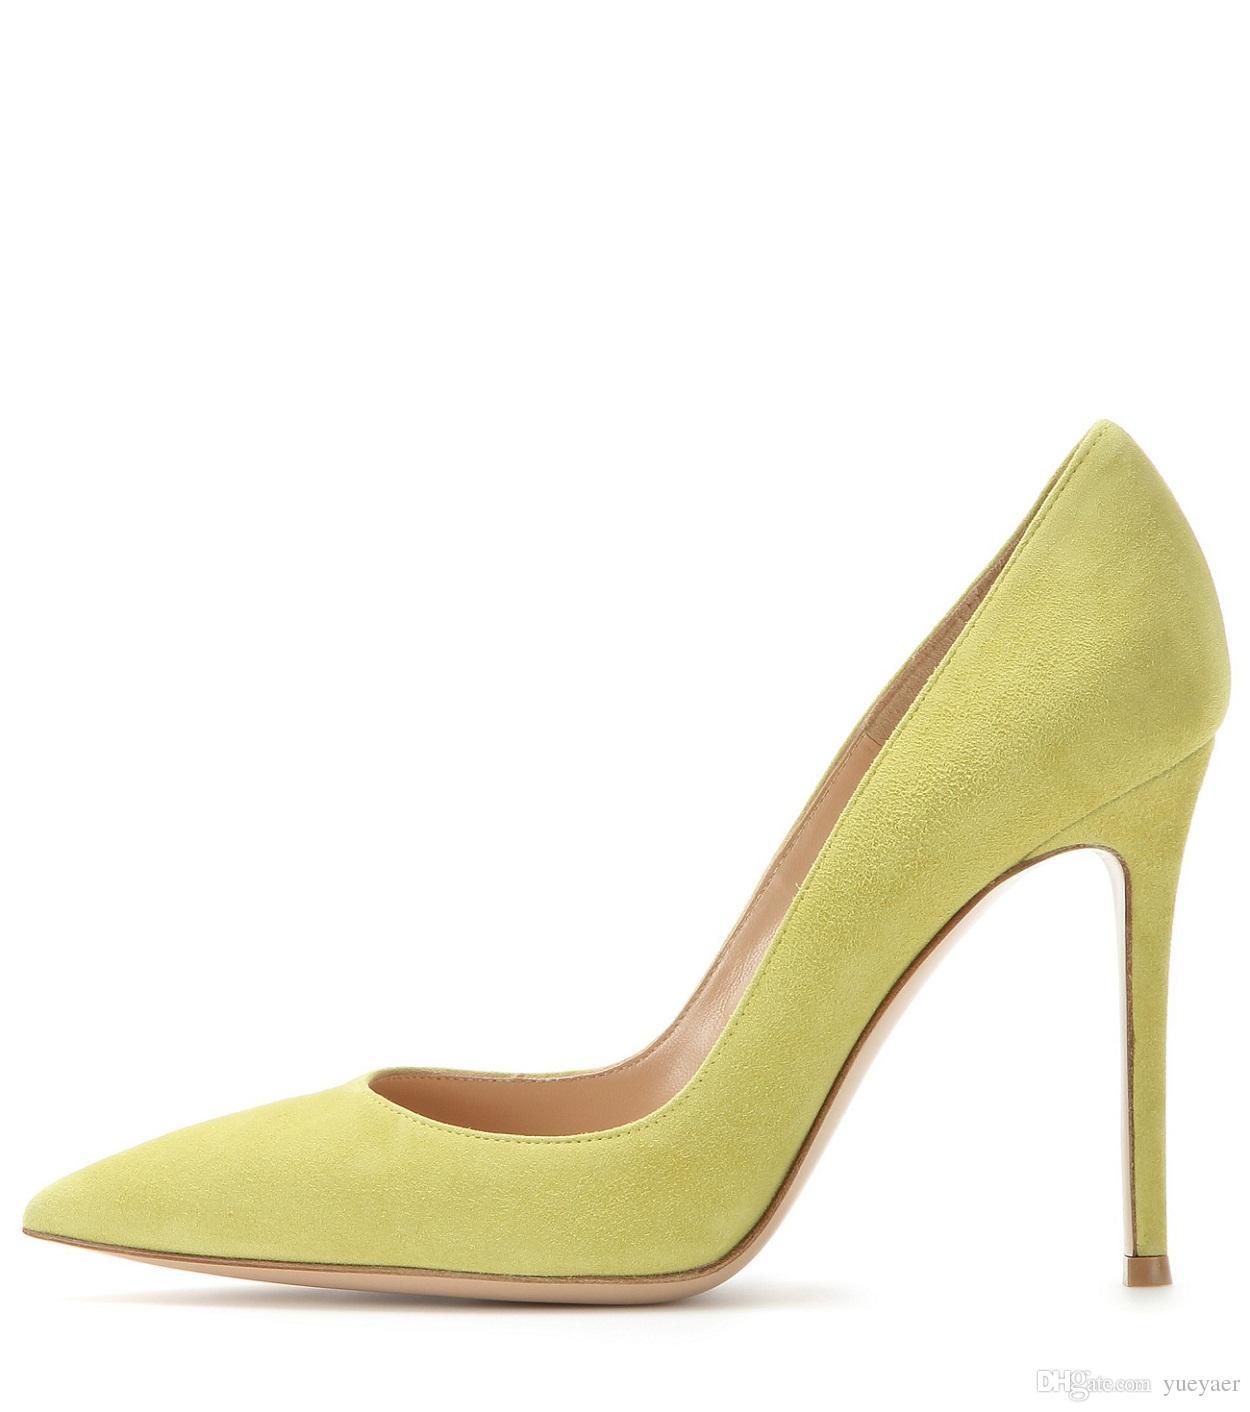 Zandina Ladies Handmade Fashion Elegant 100mm Pointy Basic Office Party Prom High Heel Pumps Shoes Lemon